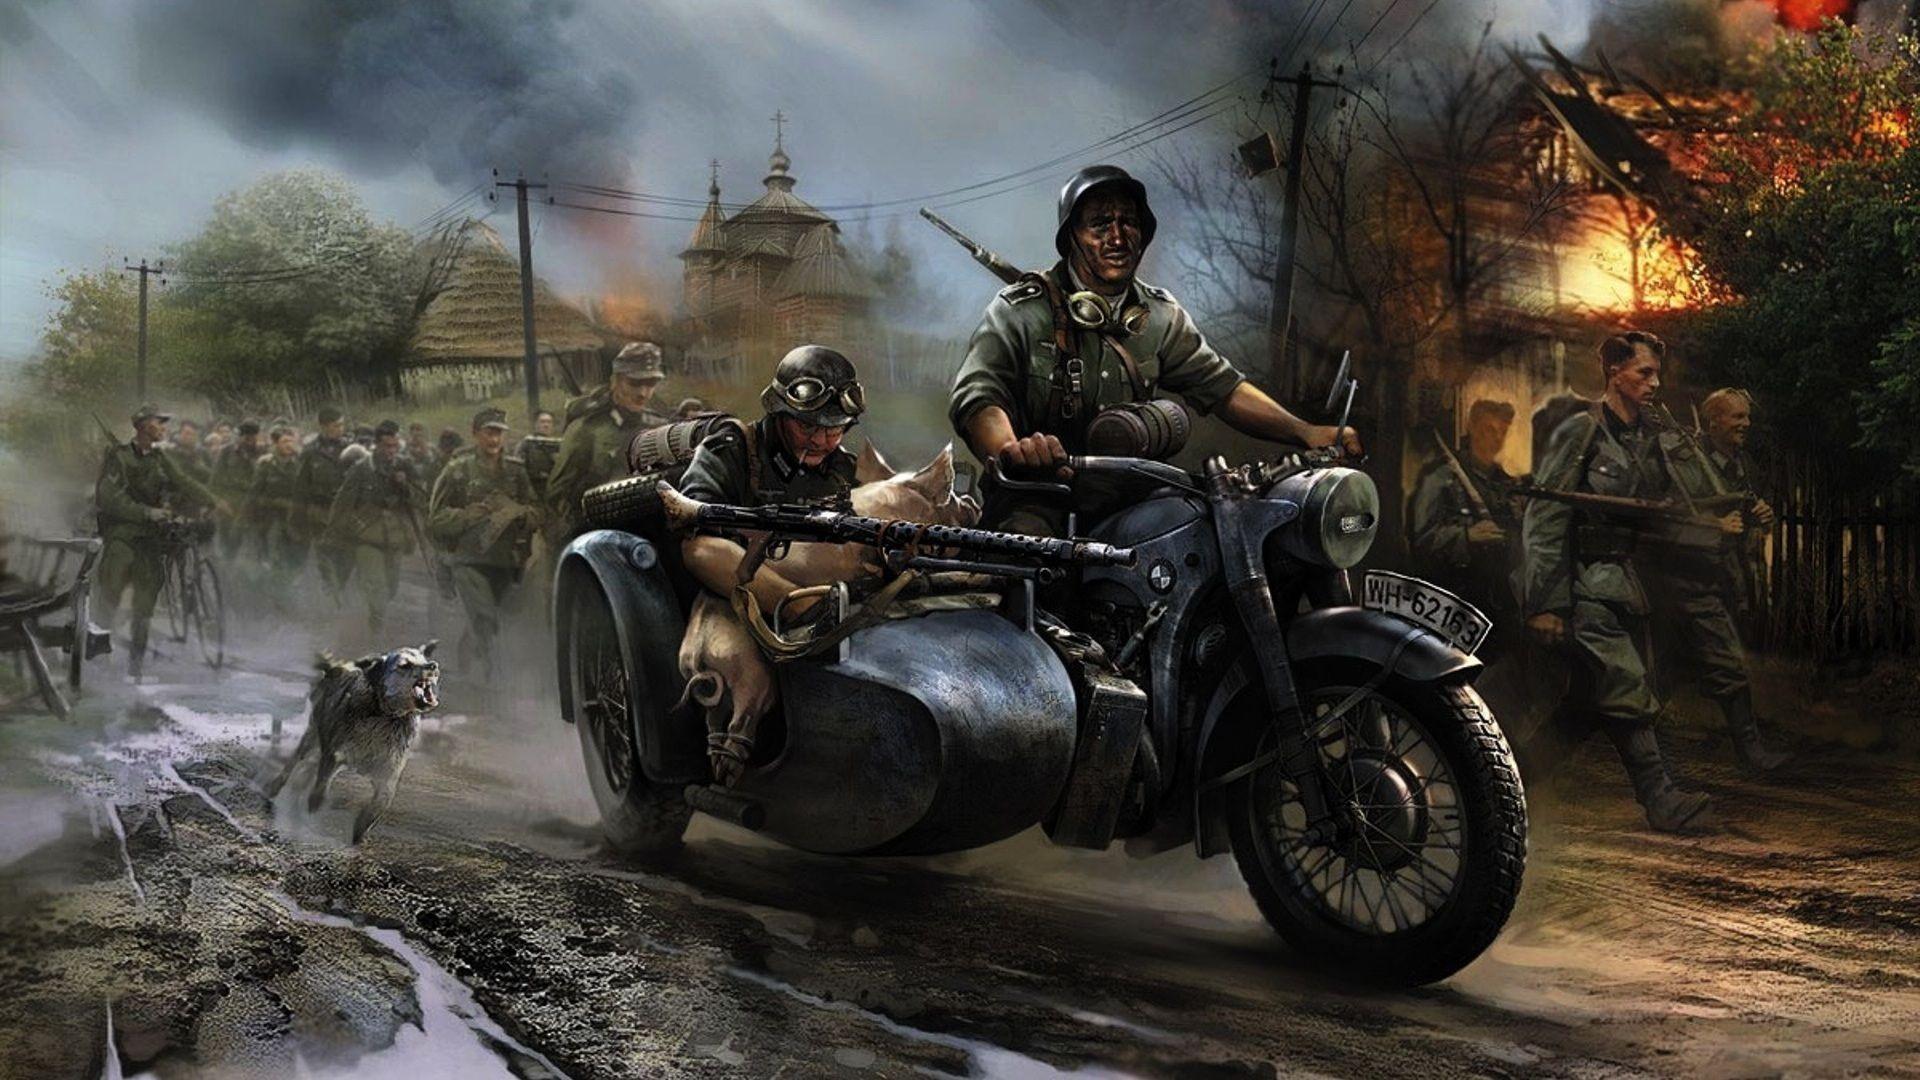 ww2 german army wallpaper - photo #1